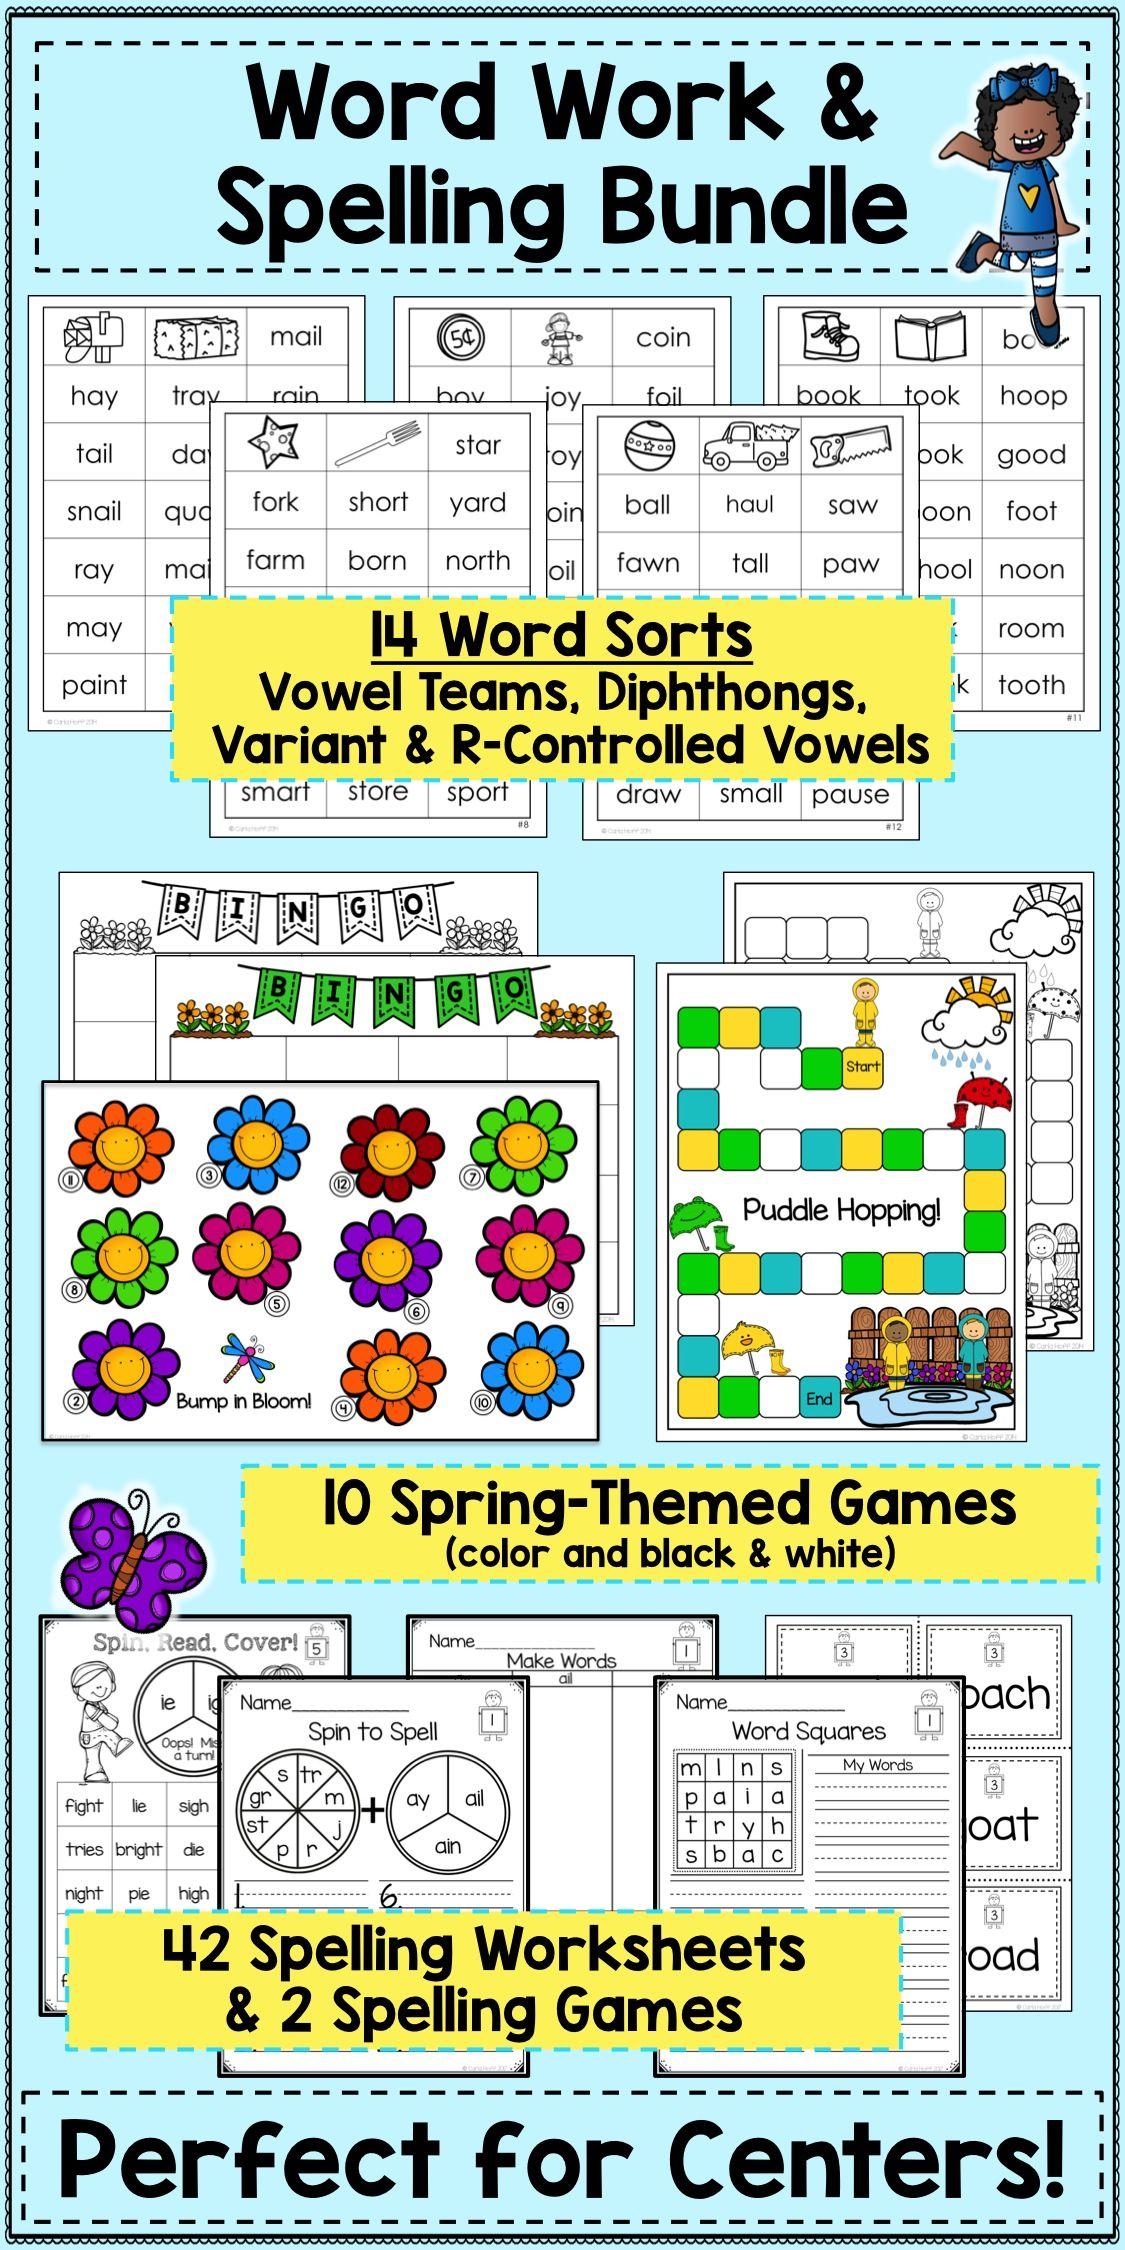 worksheet R Controlled Vowel Worksheets spring word work spelling bundle vowel teams variant vowels give your students practice reading and words with r